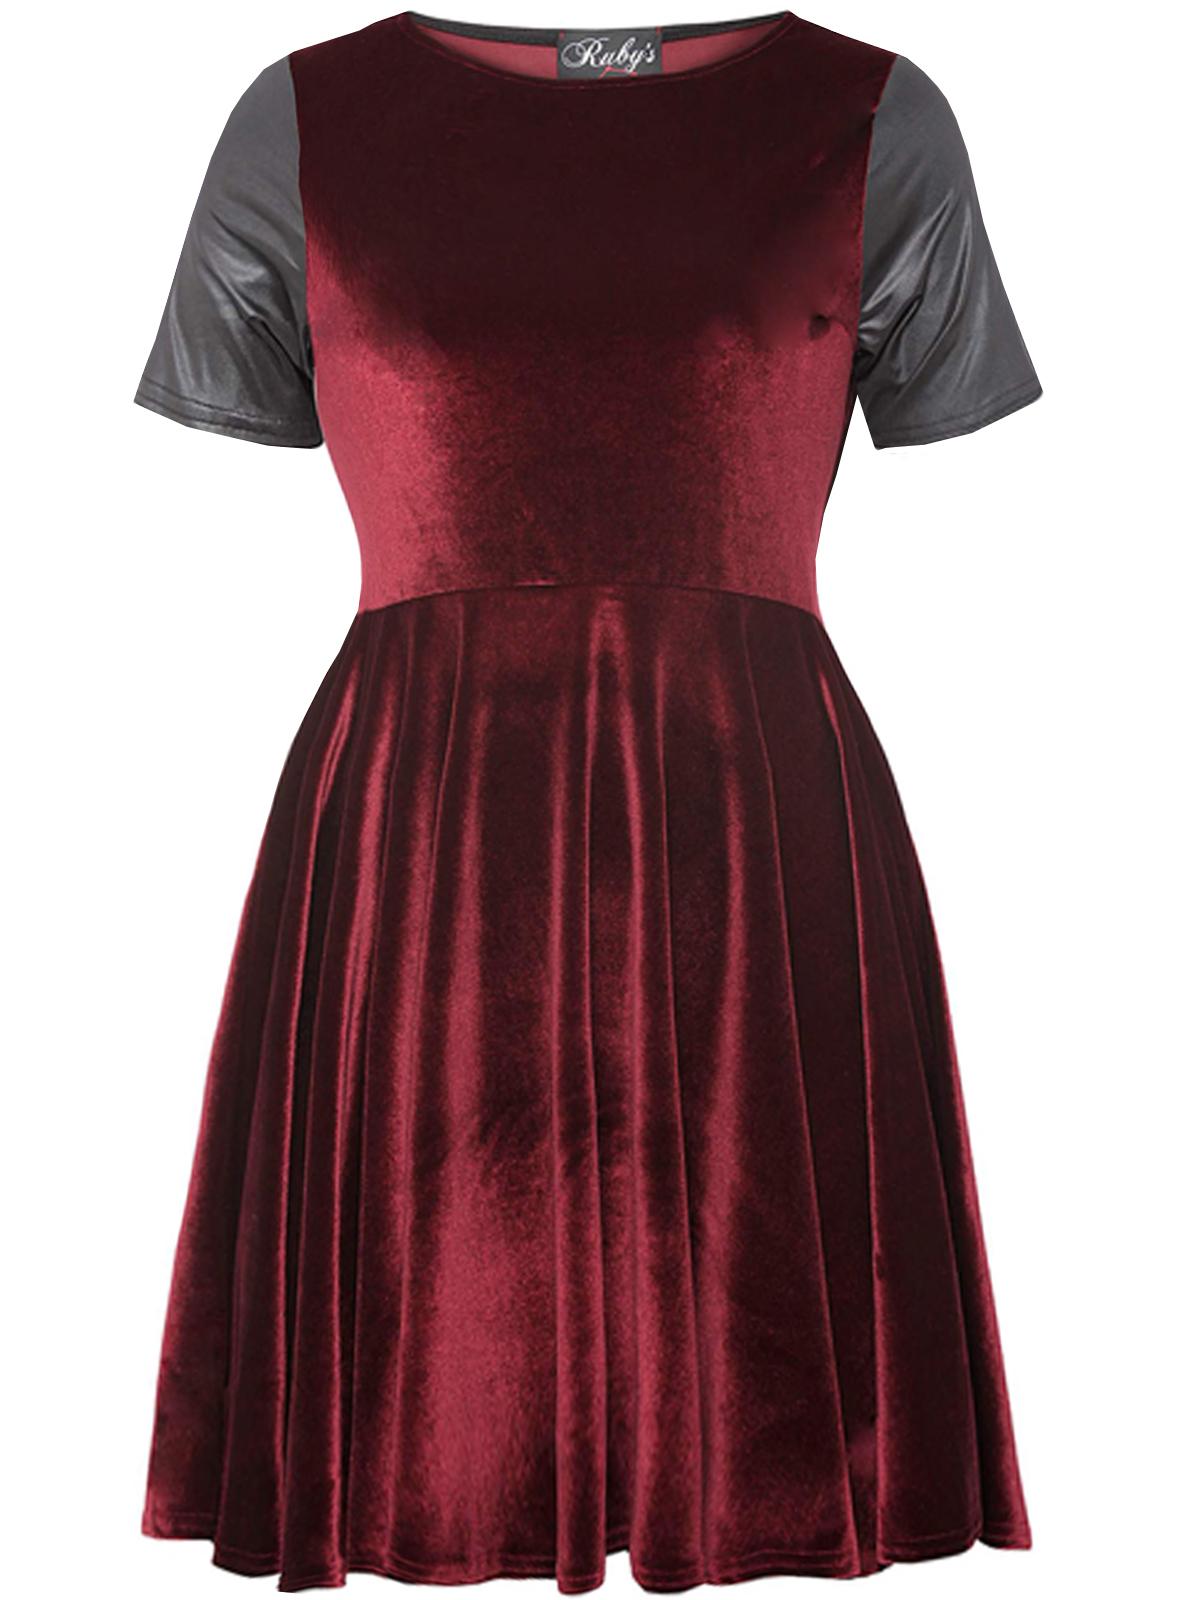 ca0ddd9d87b2 Ruby s Closet - - Ruby s Closet Burgundy Velvet Short Sleeve Skater Float  Dress - Size 16 to 22